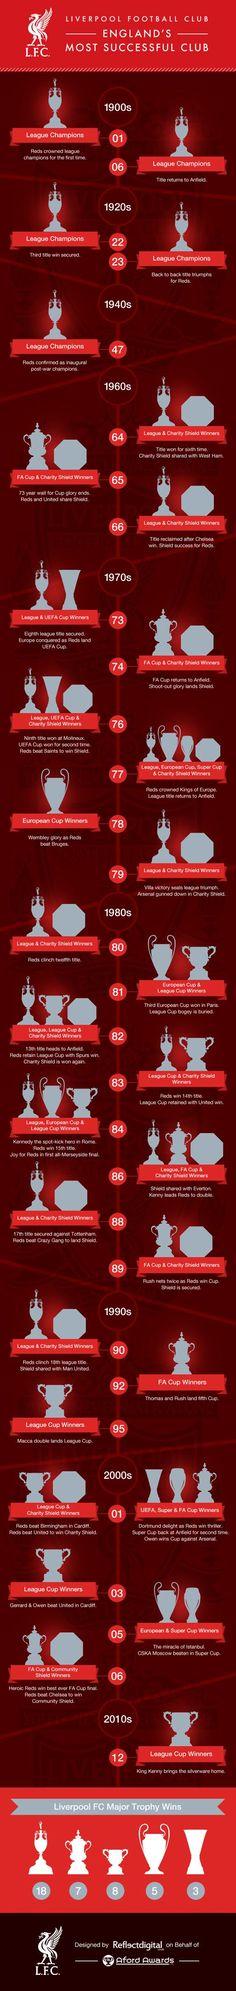 Liverpool - England's Most Successful Football Club #LFC